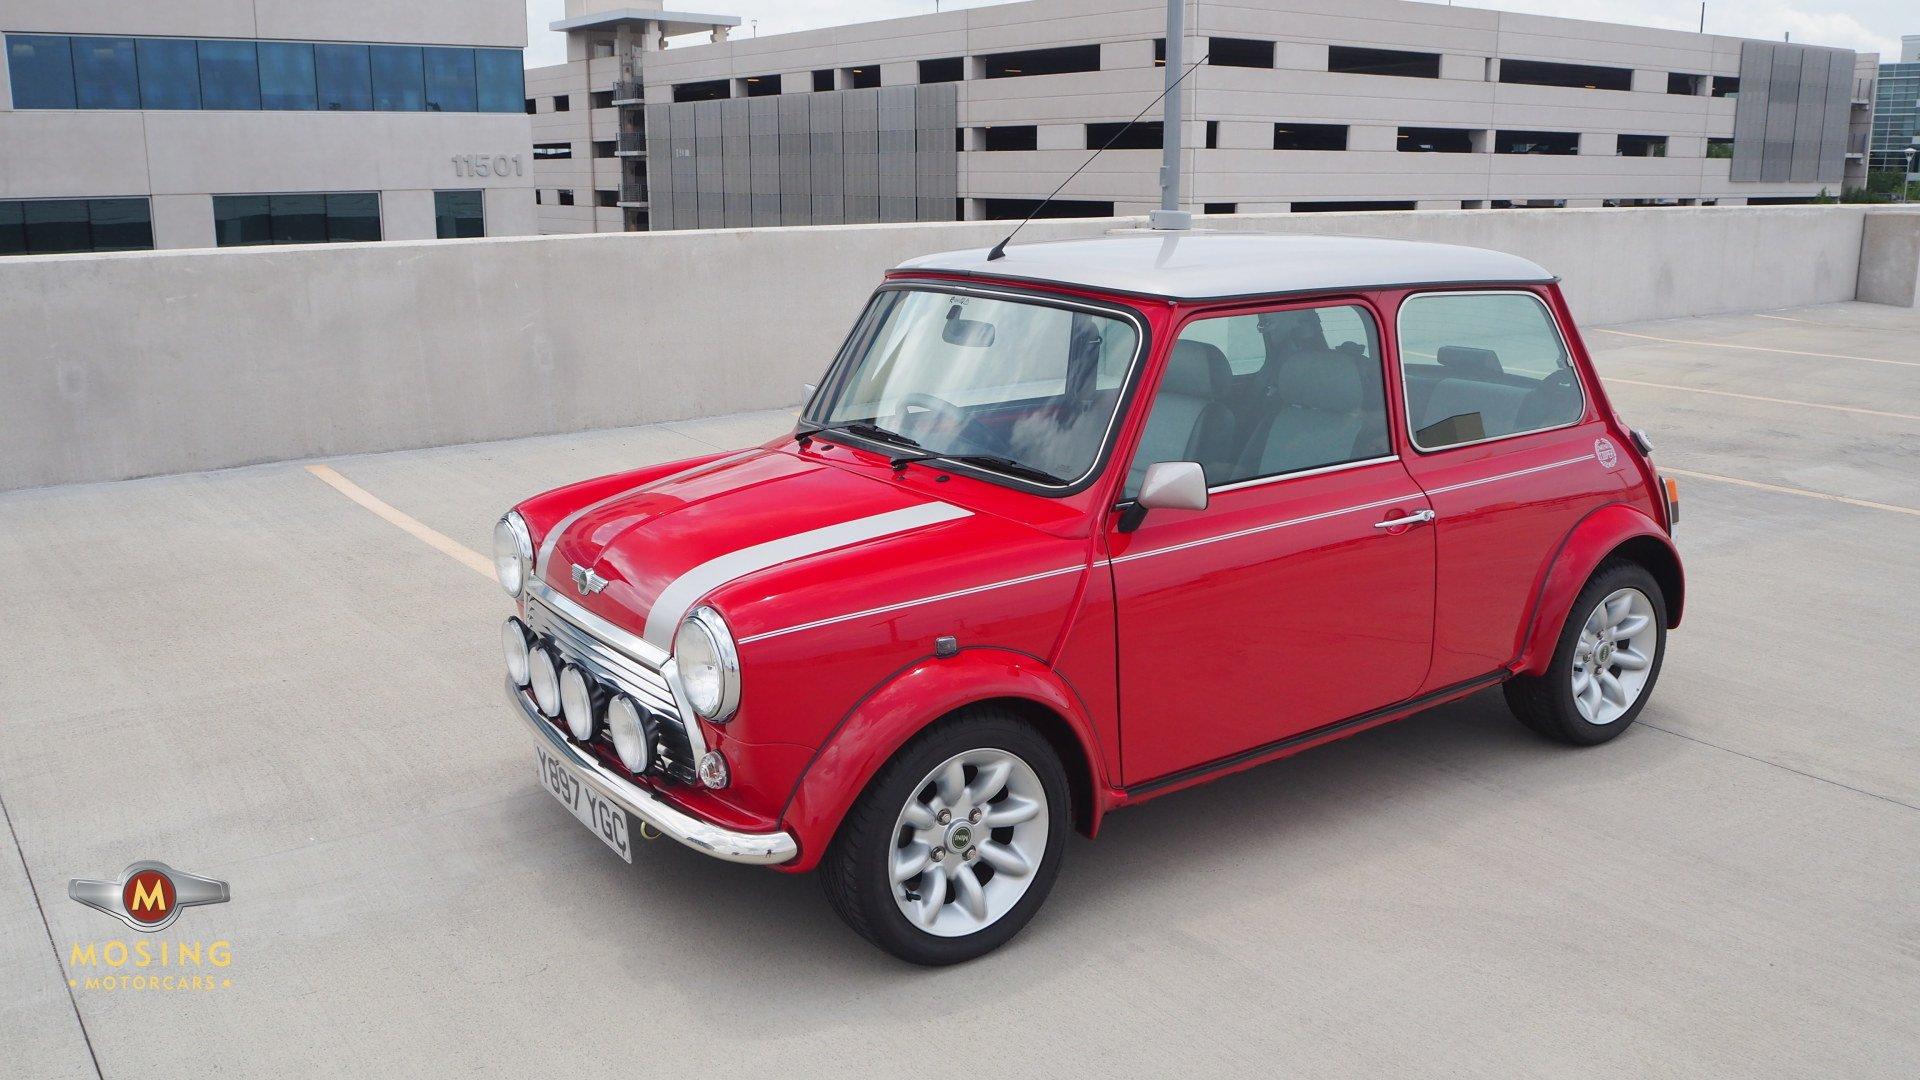 2001 austin mini classic cooper s500